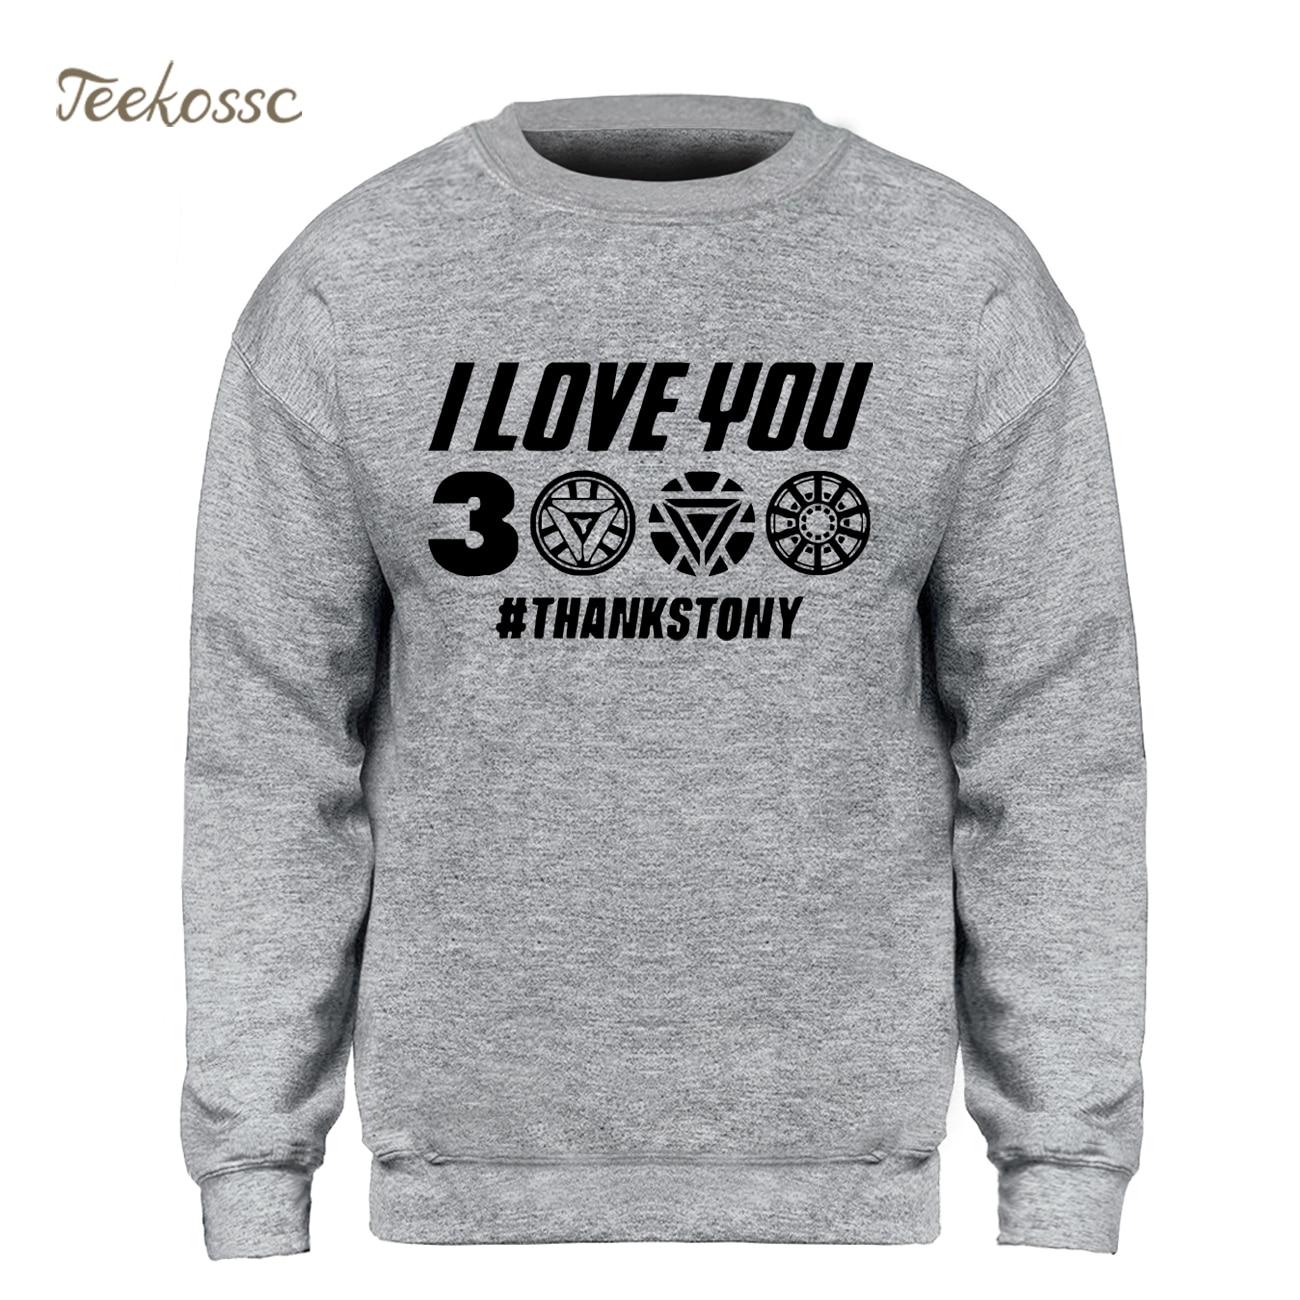 I Love You 3000 Times Sweatshirt Men Iron Man Tony Stark Hoodie Sweatshirts Winter Autumn Harajuku Funny Superhero Streetwear